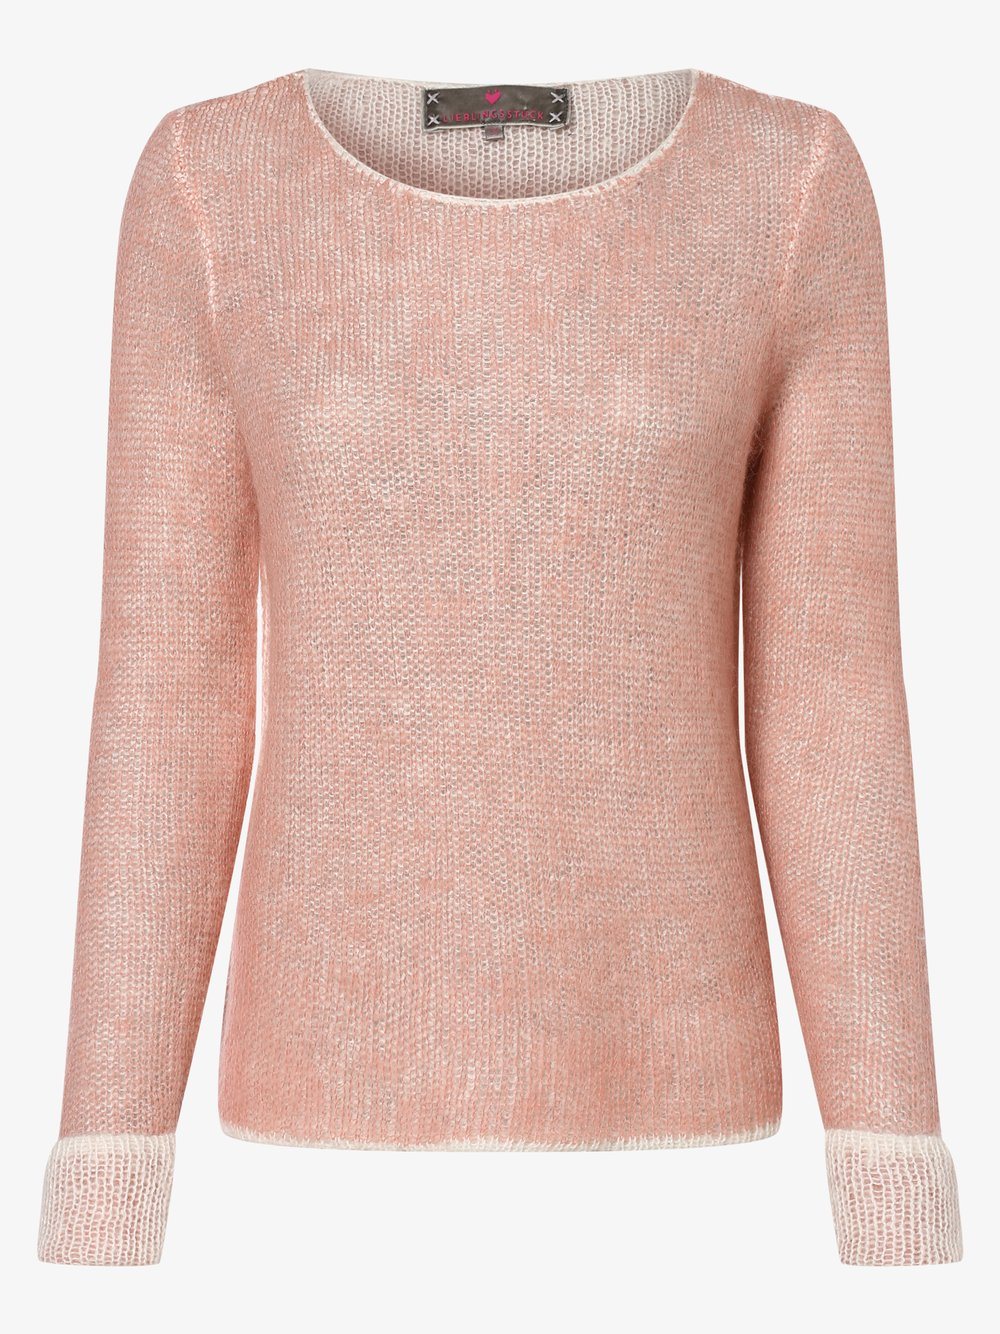 Lieblingsstück – Sweter damski z dodatkiem moheru – AgaschaL, różowy Van Graaf 457275-0001-00420